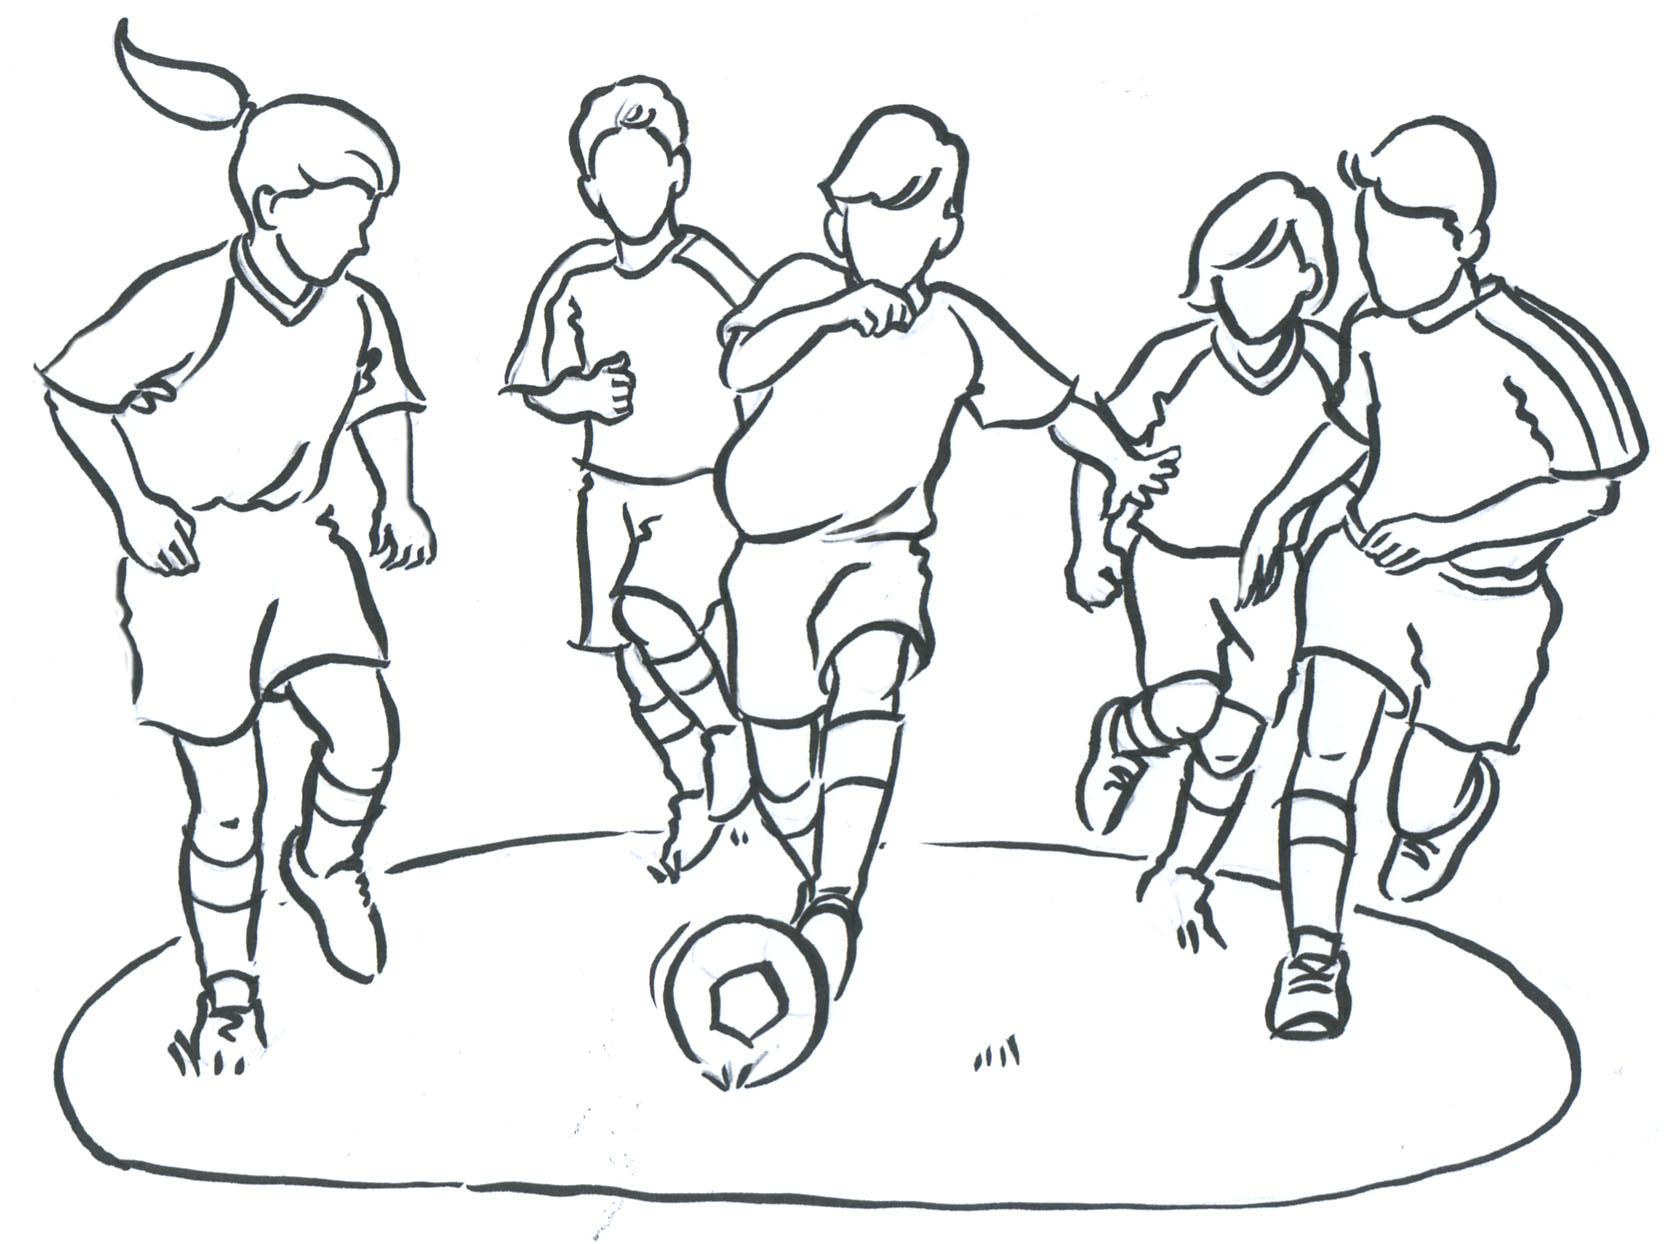 1673x1244 All Sports Drawing Sports Drawings Art